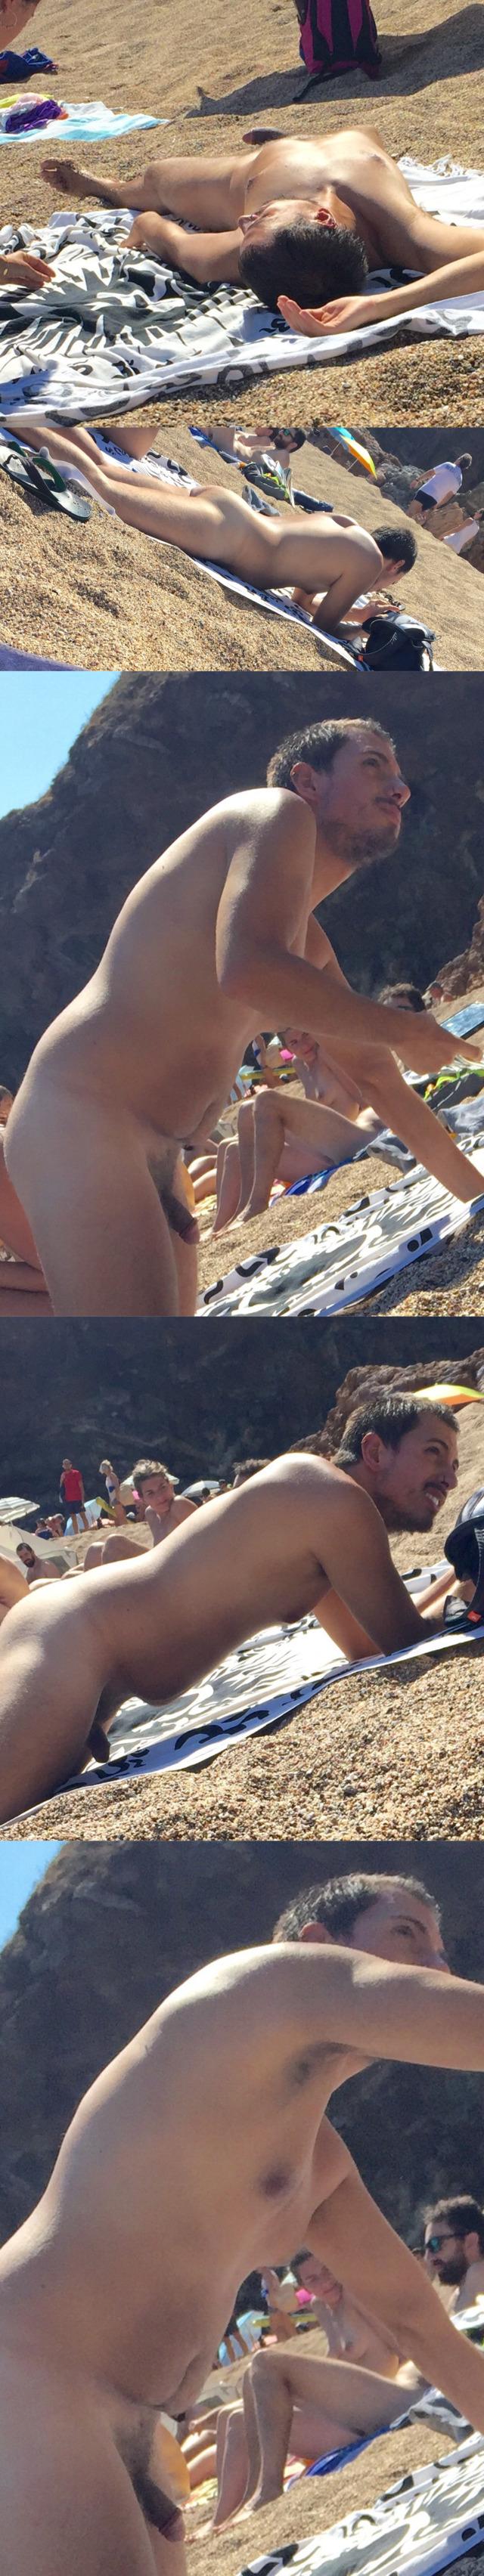 nudist-guy-big-dick-naturist-beach